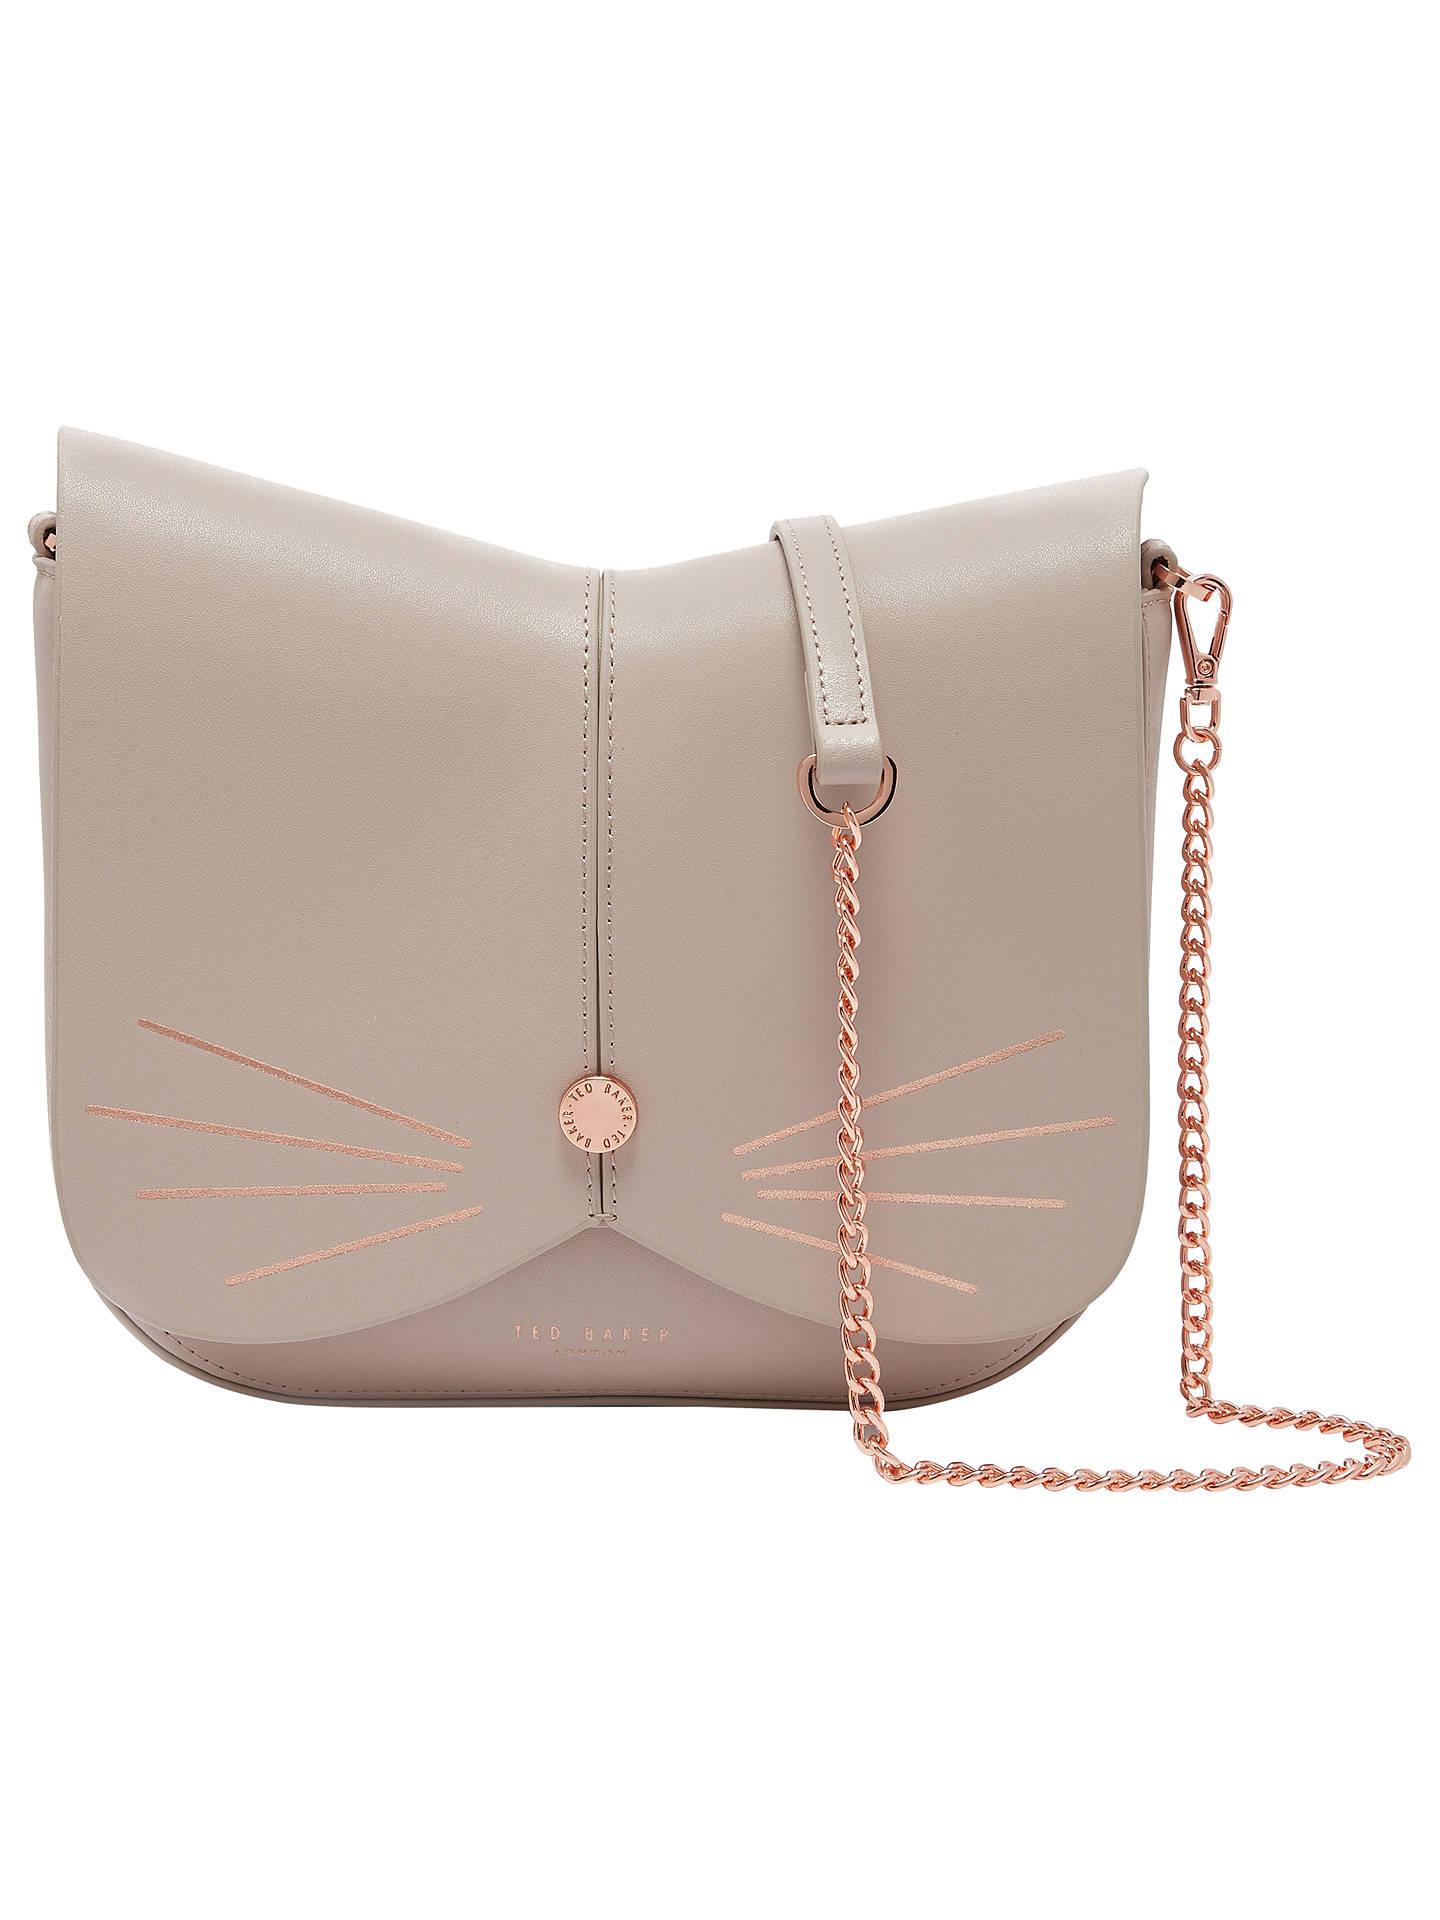 7aaaa1f9d6 Buy Ted Baker Kitti Cat Leather Across Body Bag